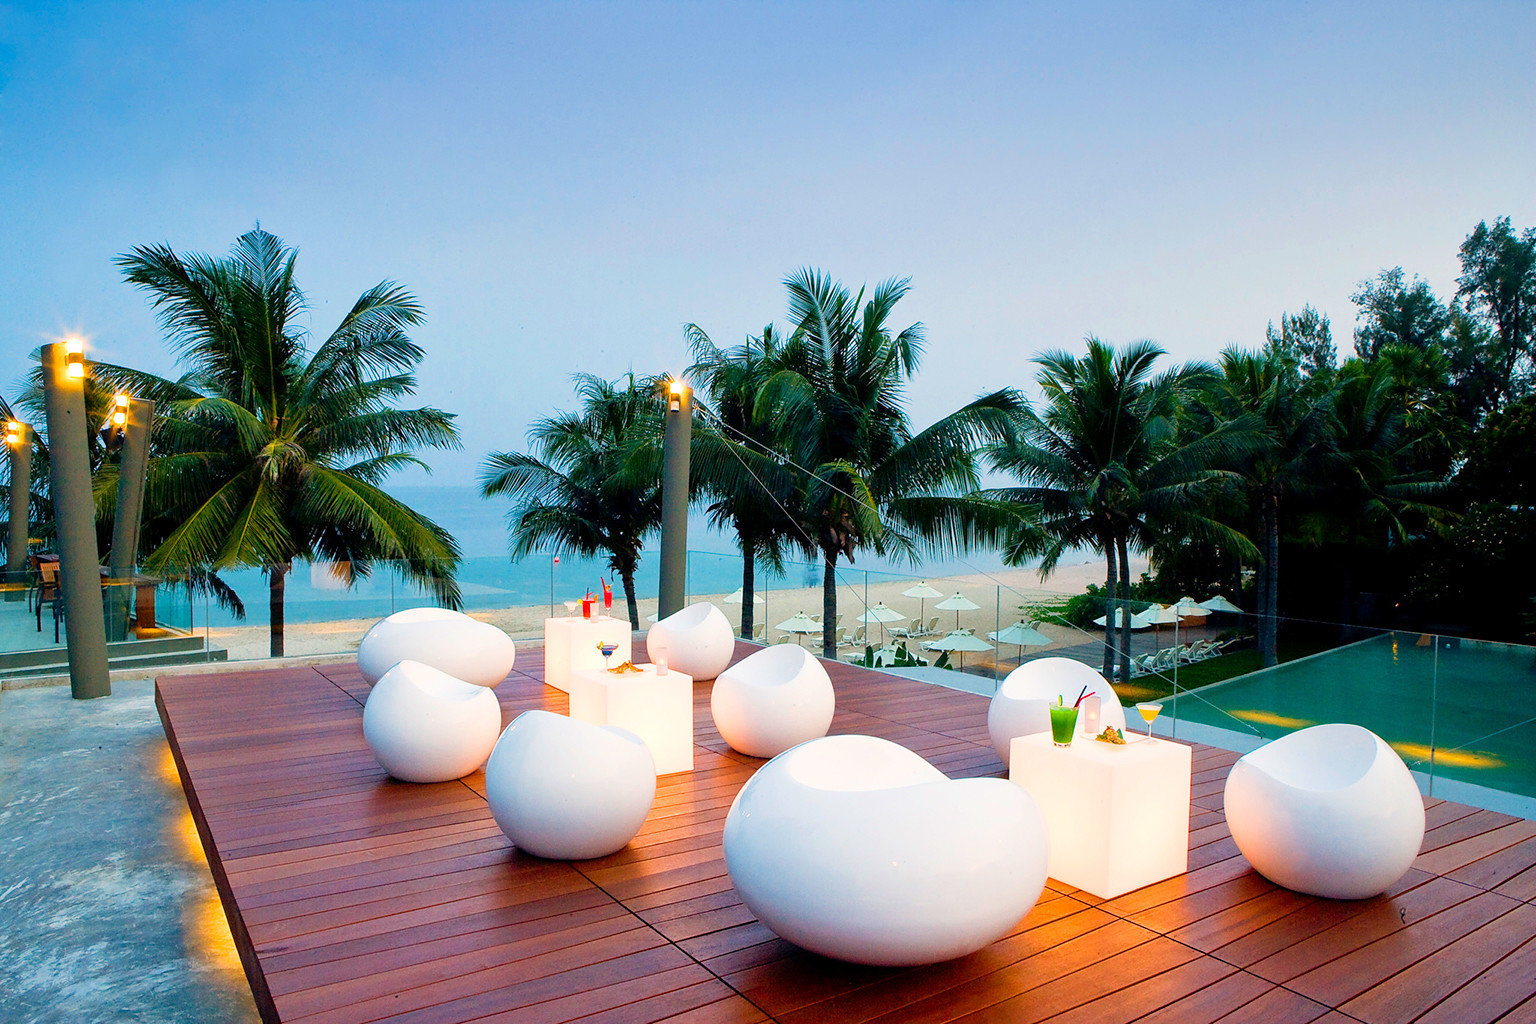 Bar Beach Family Grounds Modern Resort tree sky leisure swimming pool arecales Villa